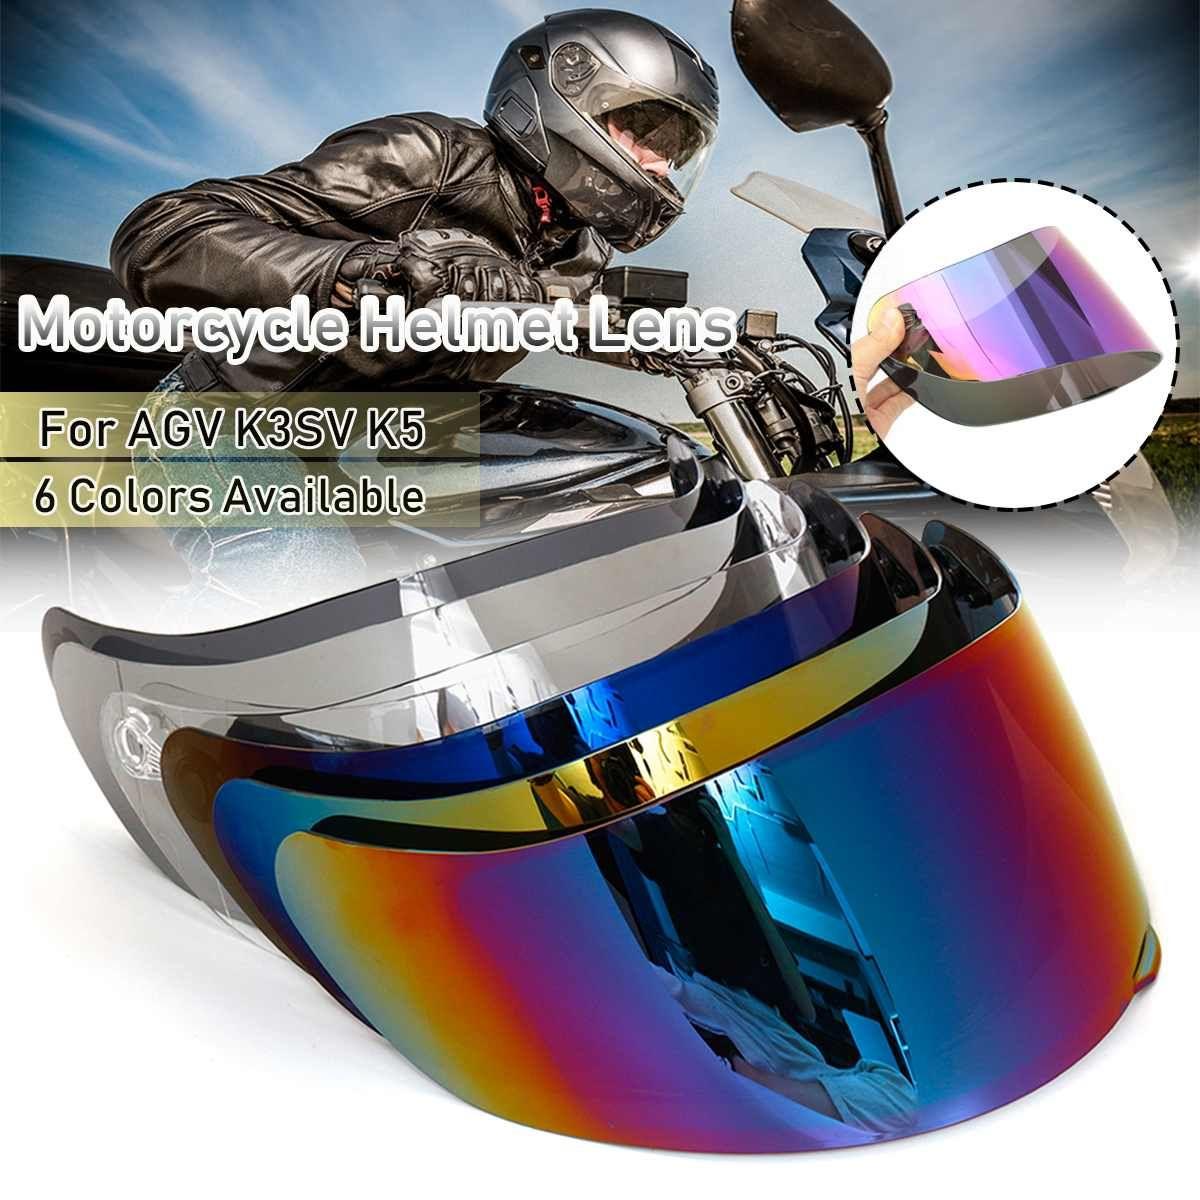 Helm visier für AGV K5 K3 SV Motorrad Abnehmbare Helm original gläser für agv k3 sv k5 motorrad helm Objektiv volle gesicht